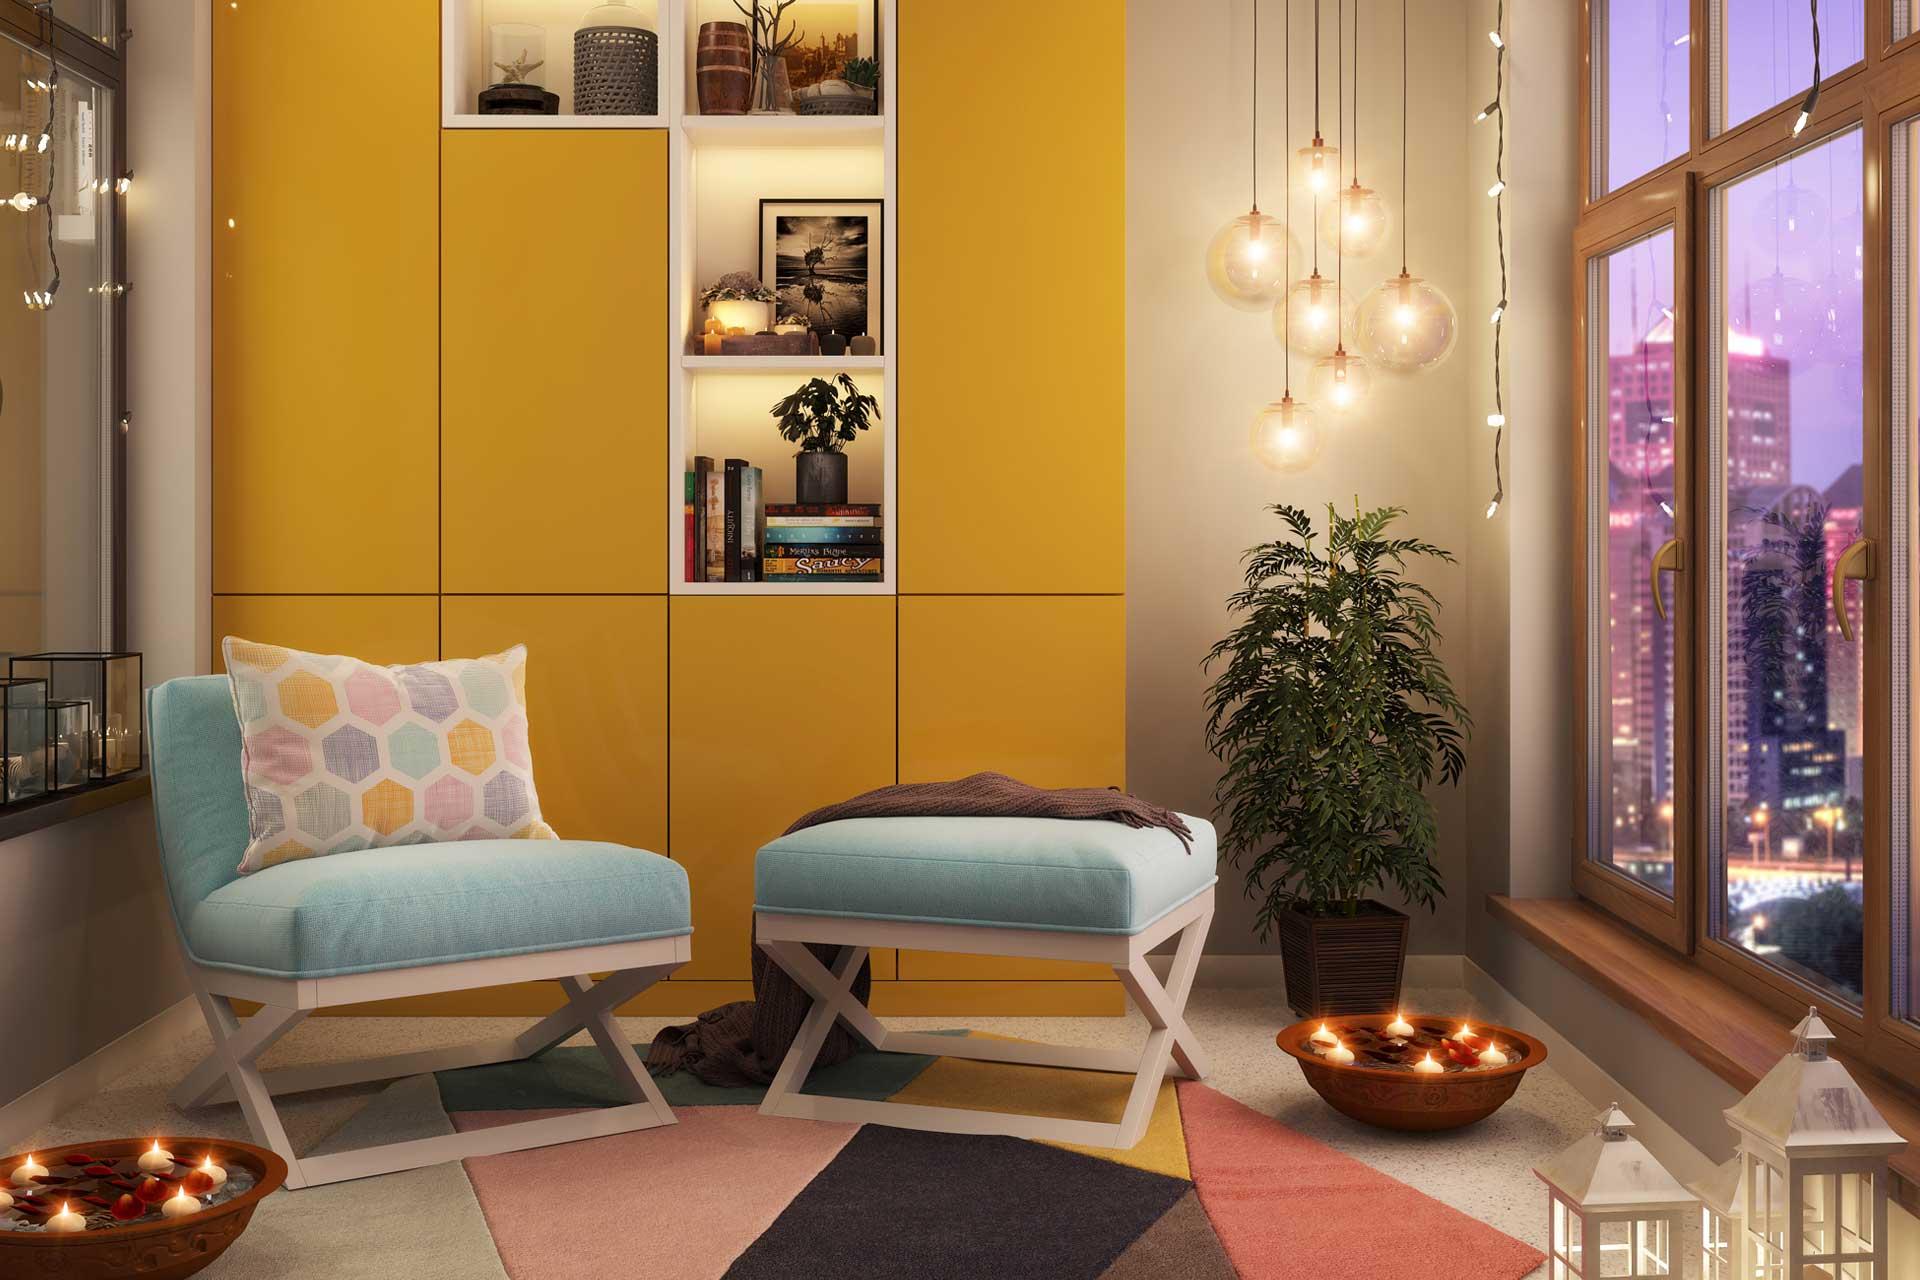 25 Best Diwali Decoration Ideas For Your Home Design Cafe